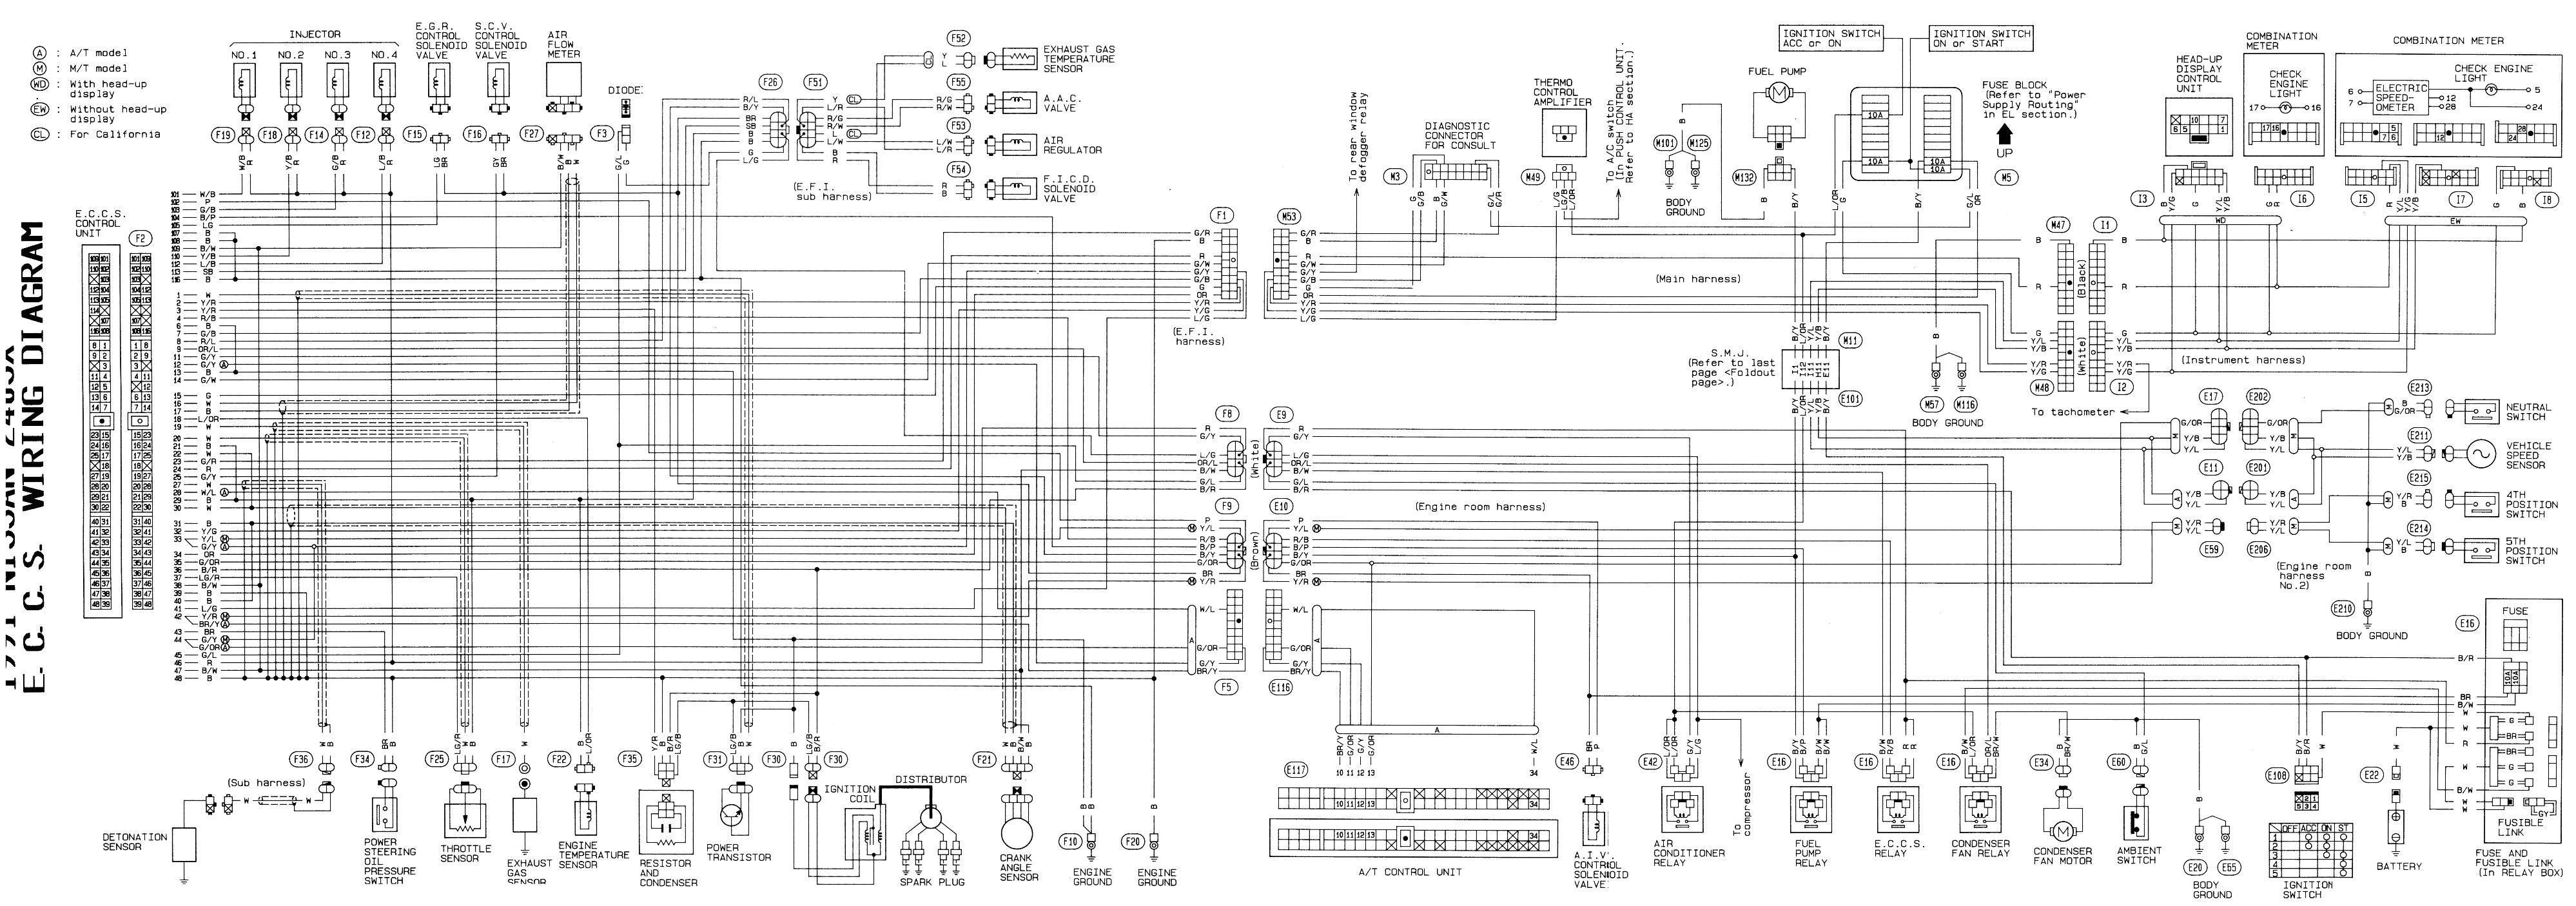 s14 240sx wiring diagram wiring diagram load nissan 240sx ka24de wiring harness wiring diagram expert s14